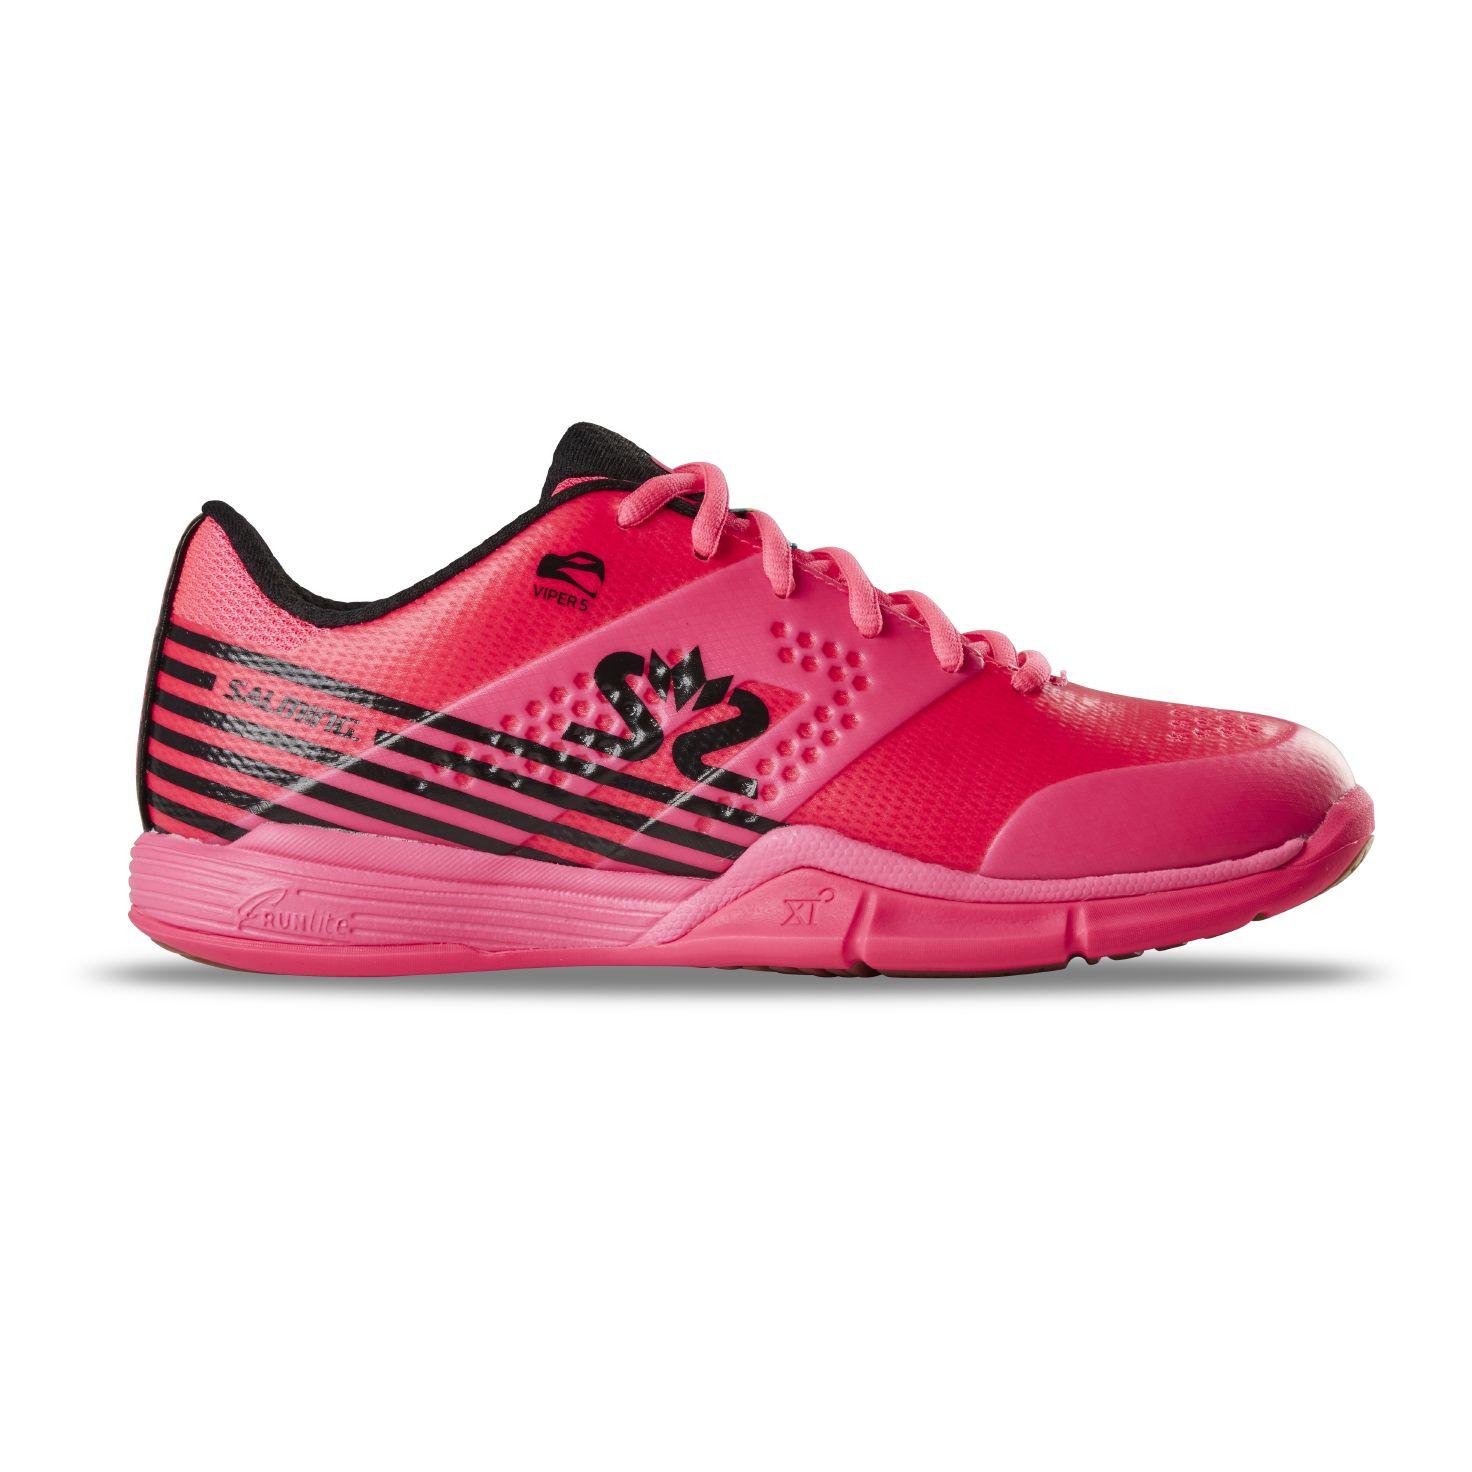 Salming Viper 5 Shoe Women Pink/Black 6 UK - 39 1/3 EUR - 25 cm